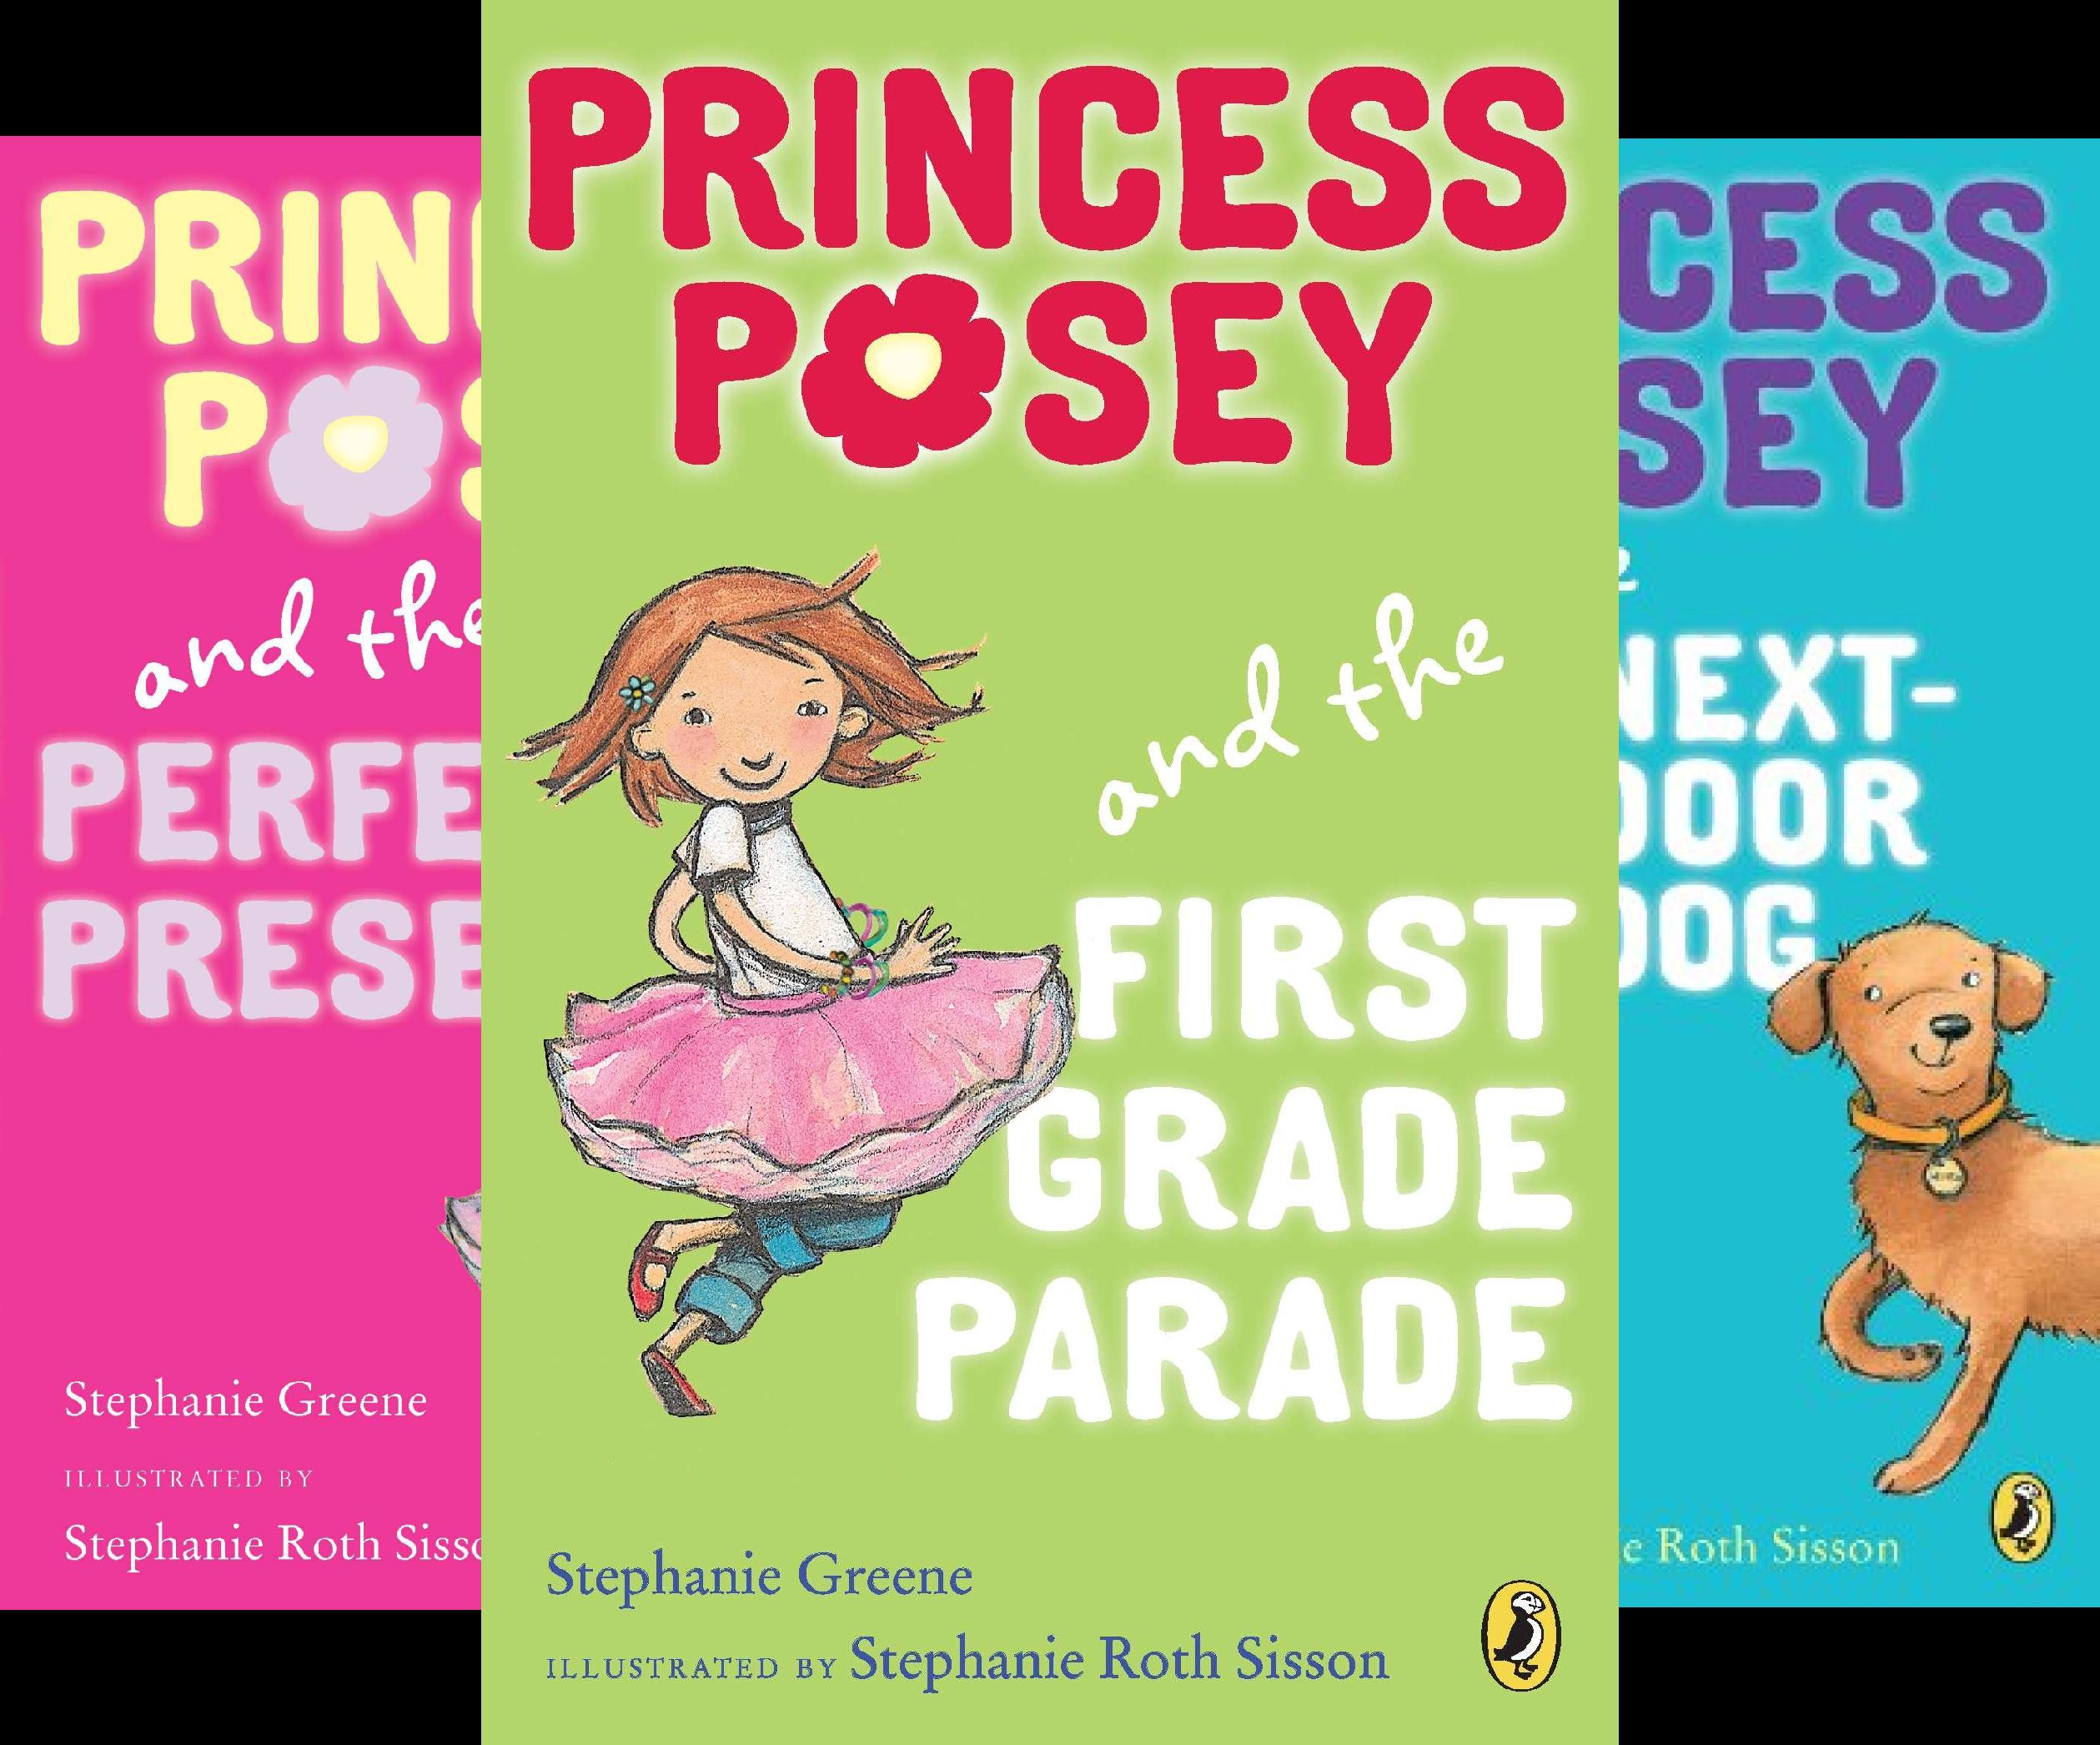 Princess Posey, First Grader (12 Book Series) ()